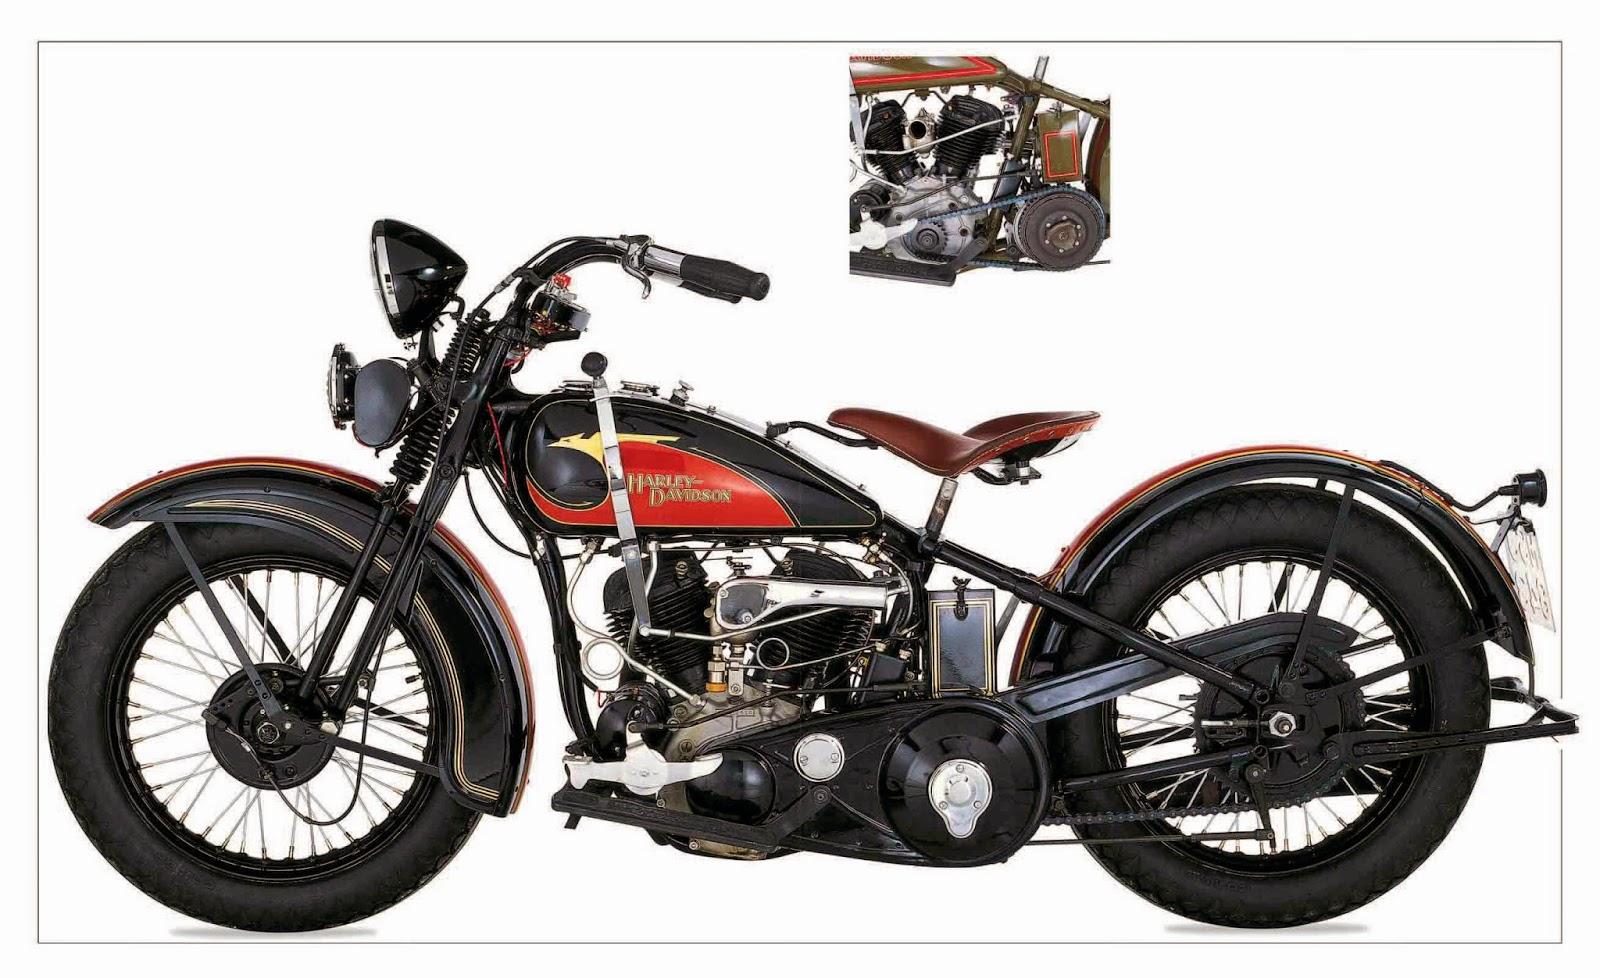 For A Harley Ironhead Xlch Wiring Diagram Real 77 Sportster Xl 74 Shovelhead